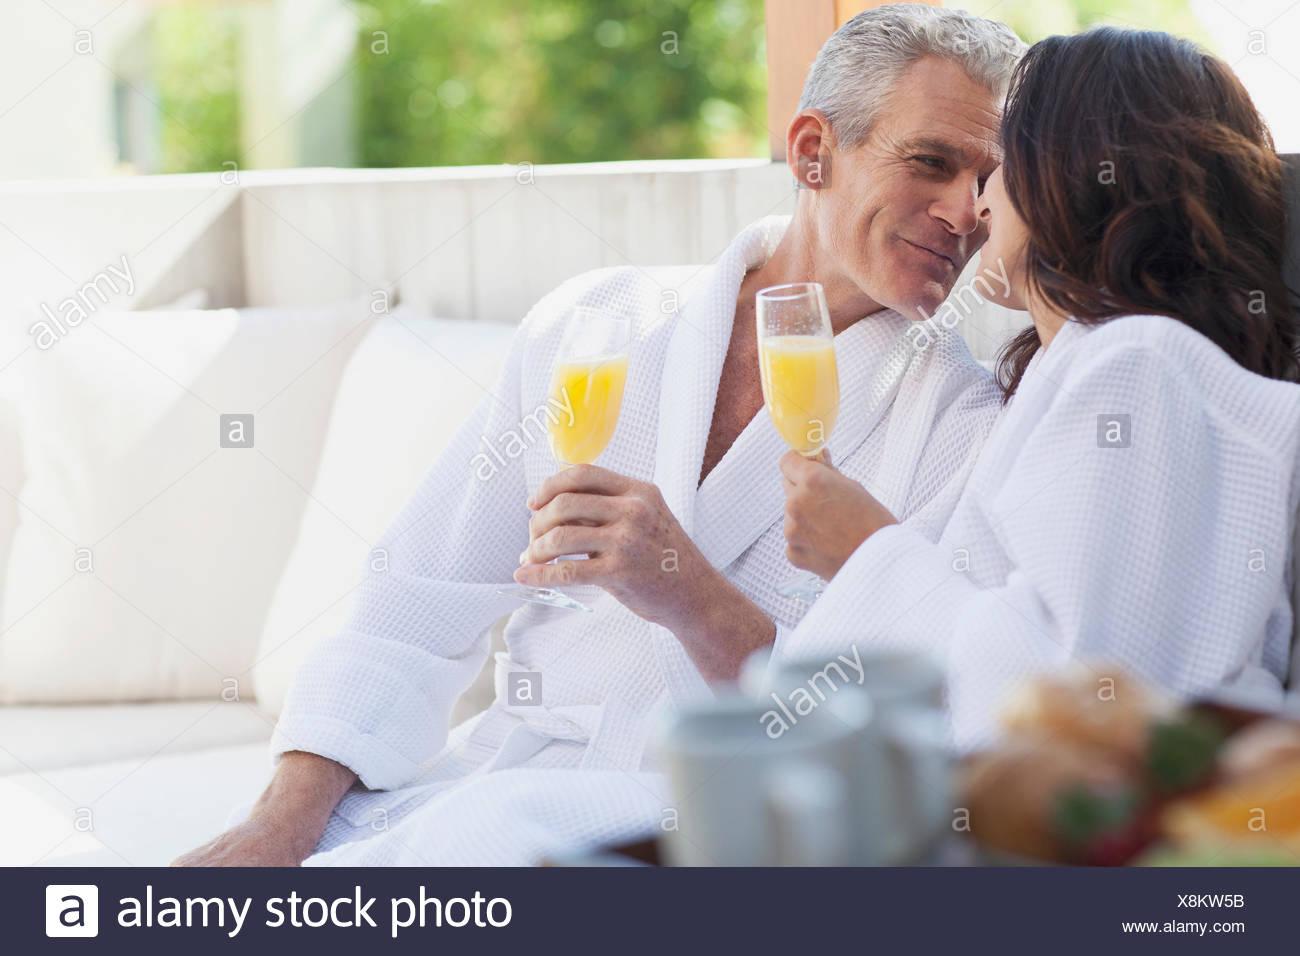 couple in robes drinking orange juice - Stock Image